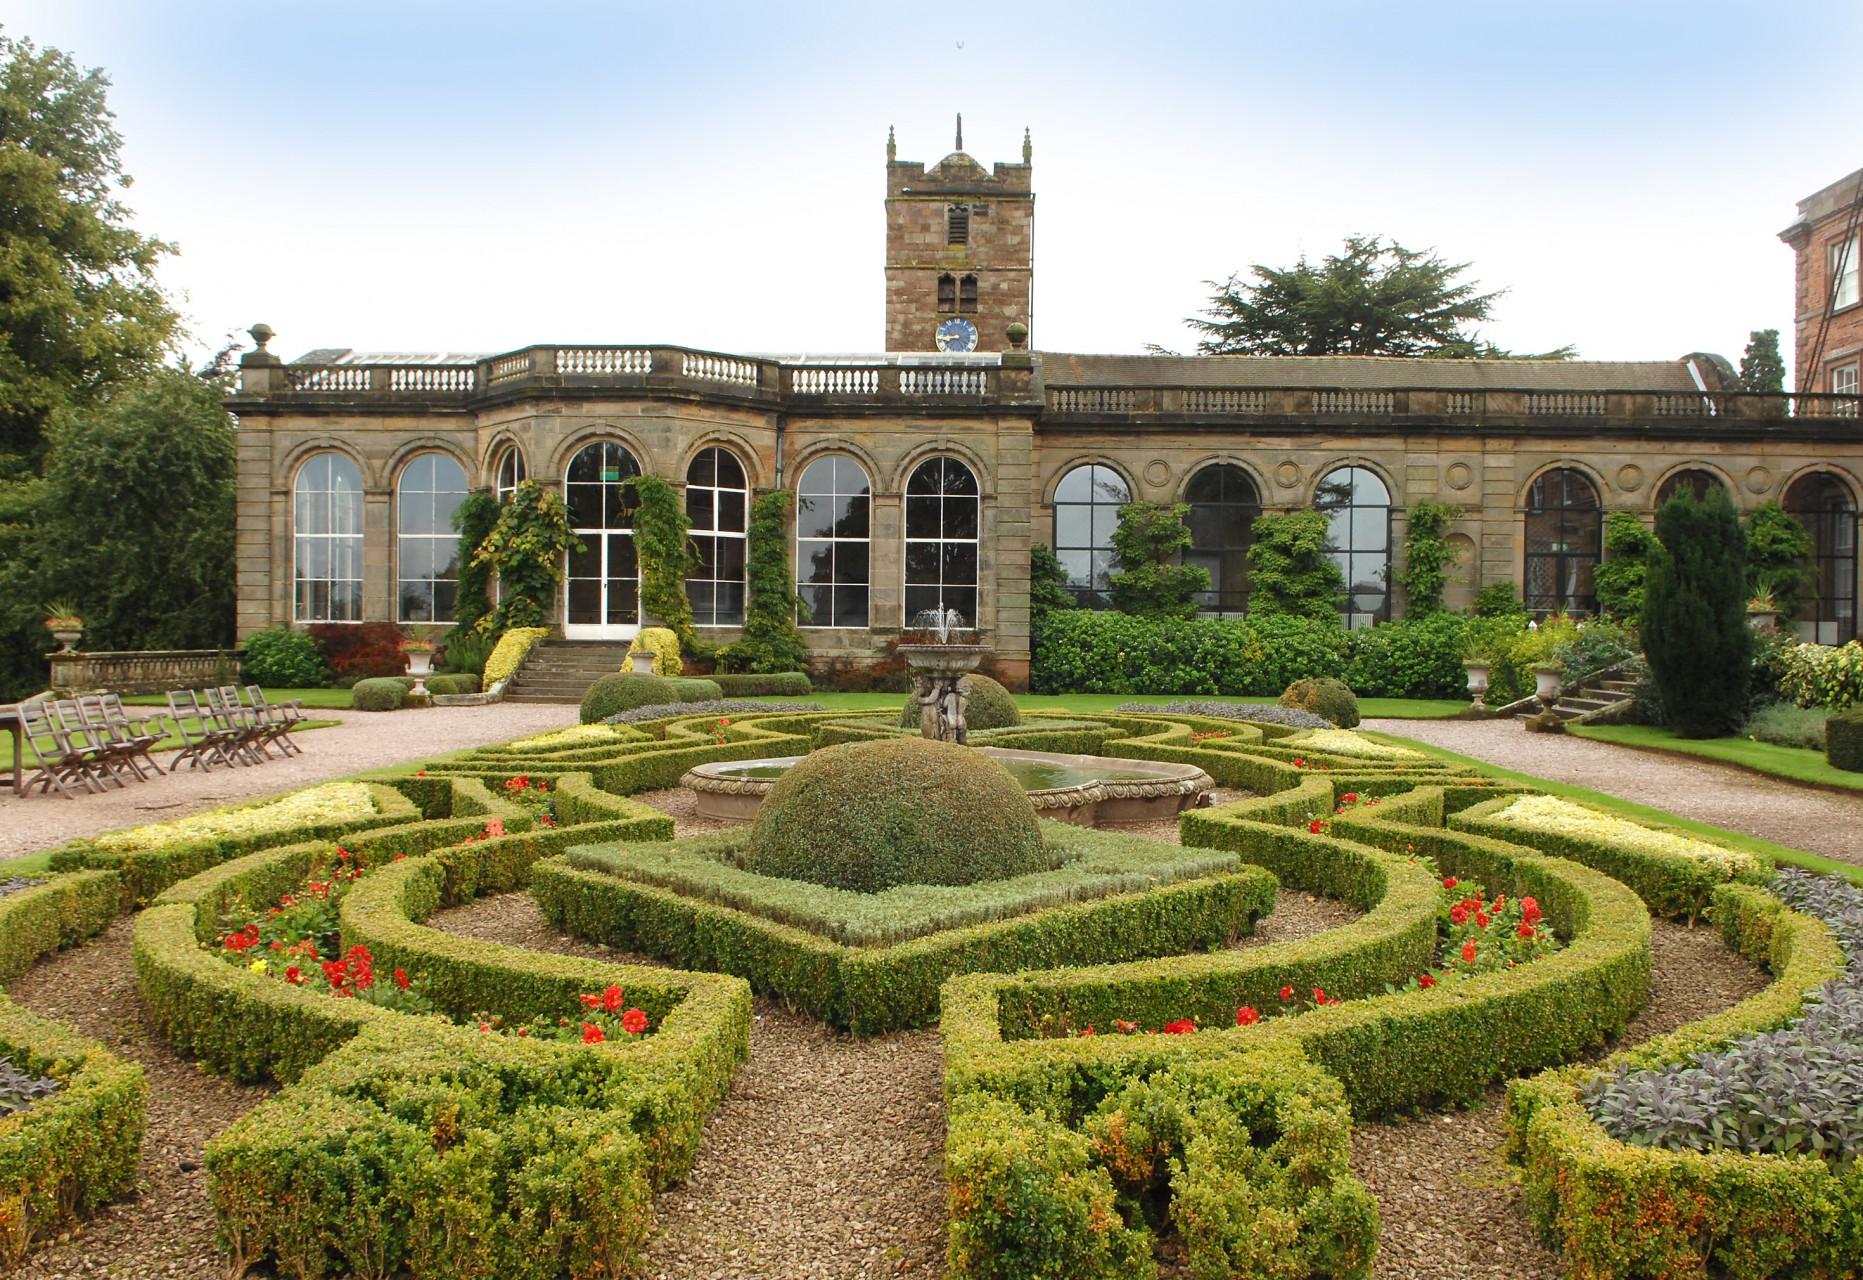 Italian Gardens at Weston Park